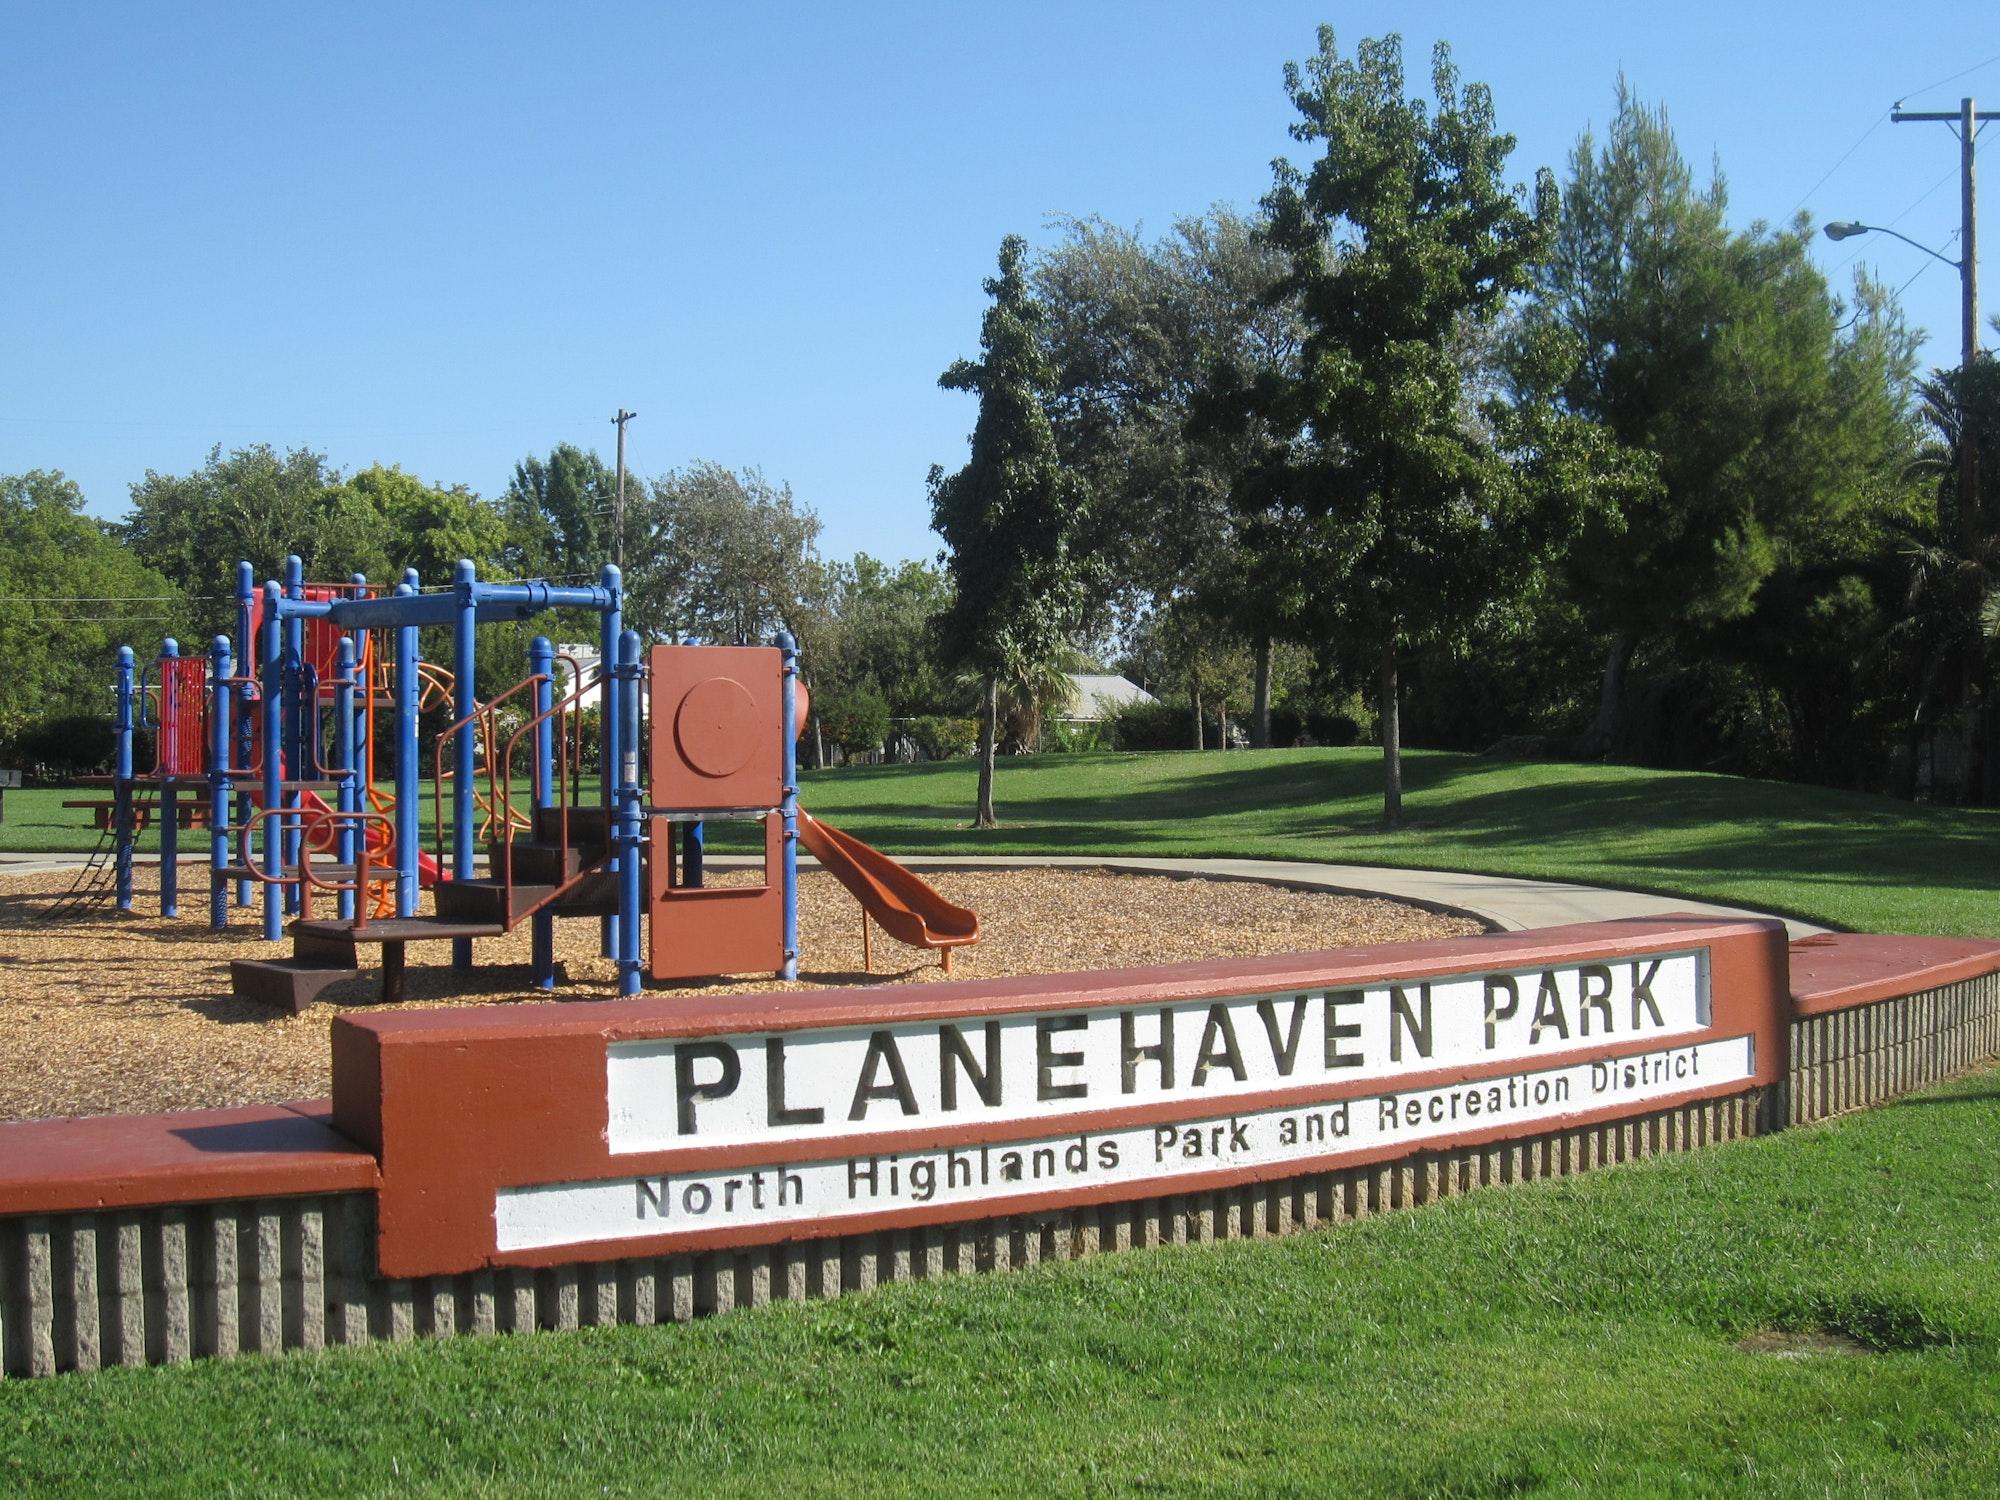 Planehaven Park playground